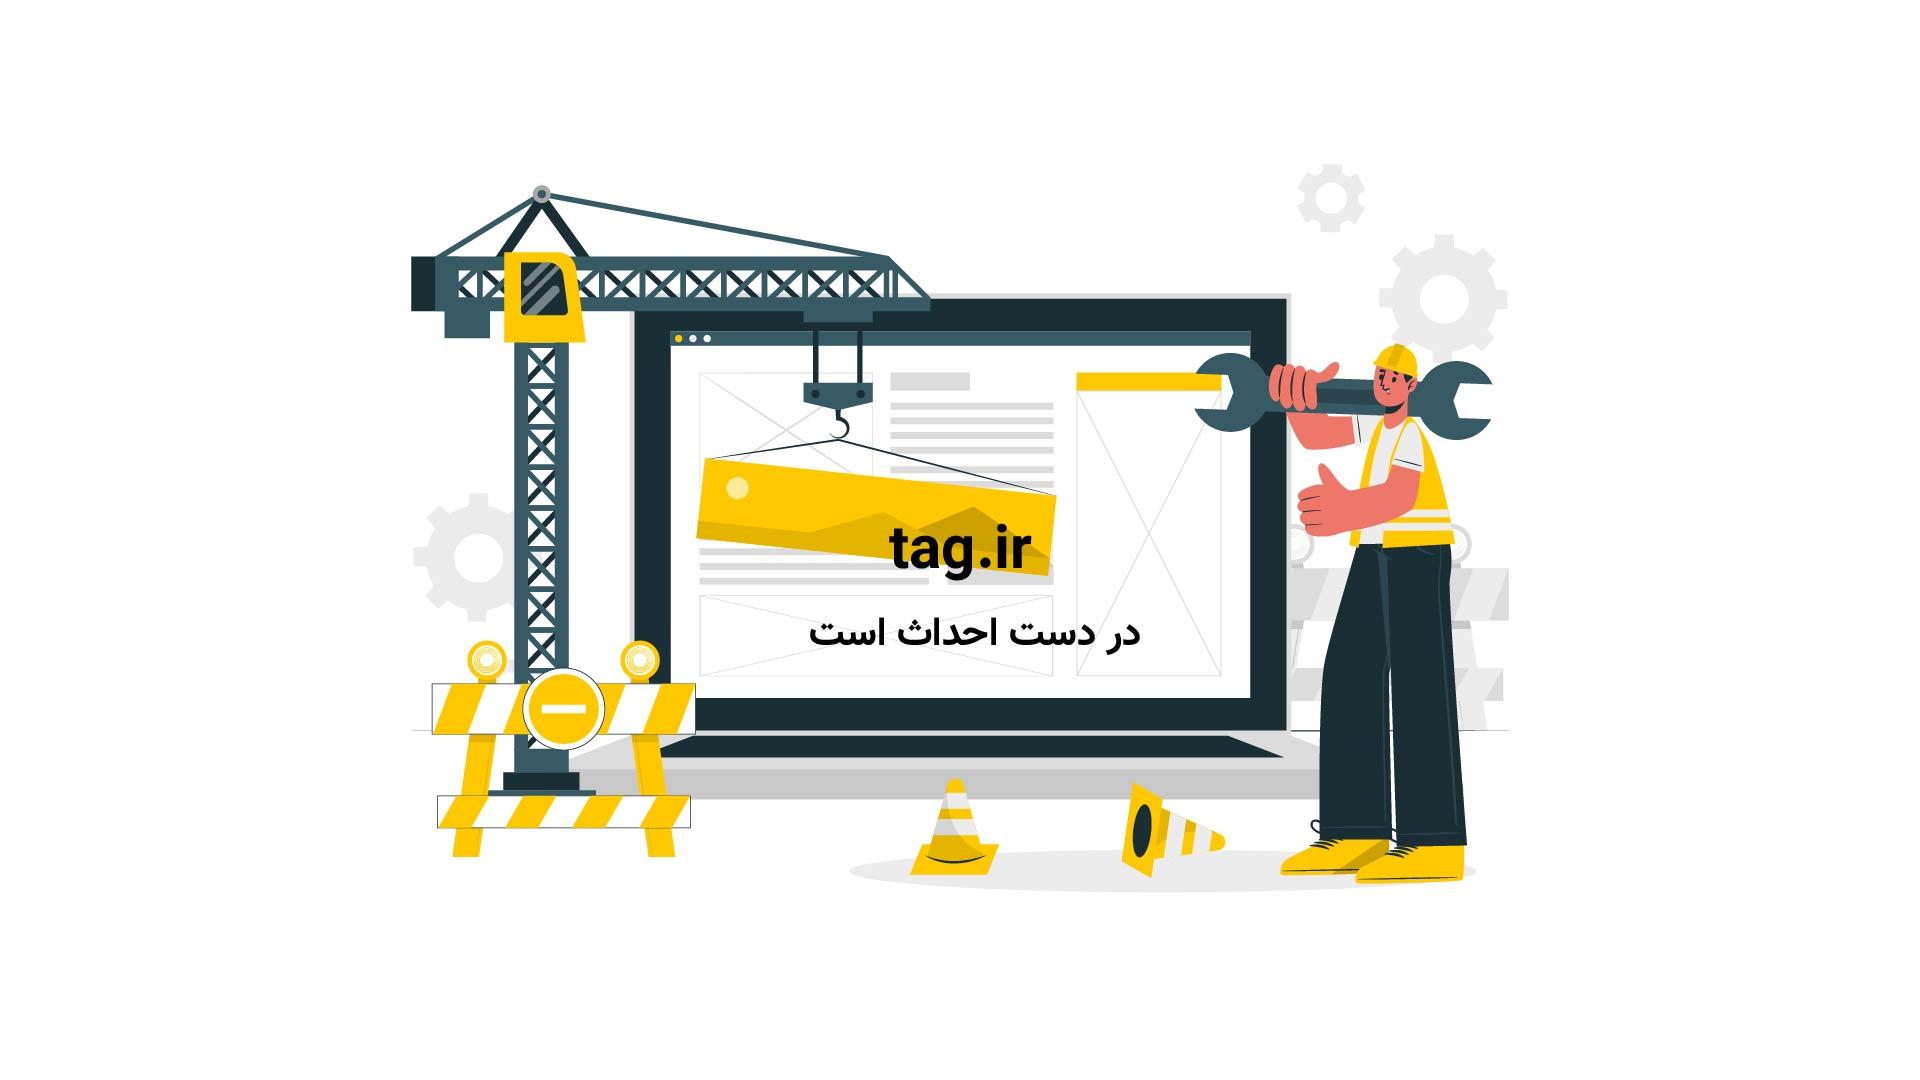 حمله ۱۵ شیر گرسنه به گوساله بوفالو | فیلم